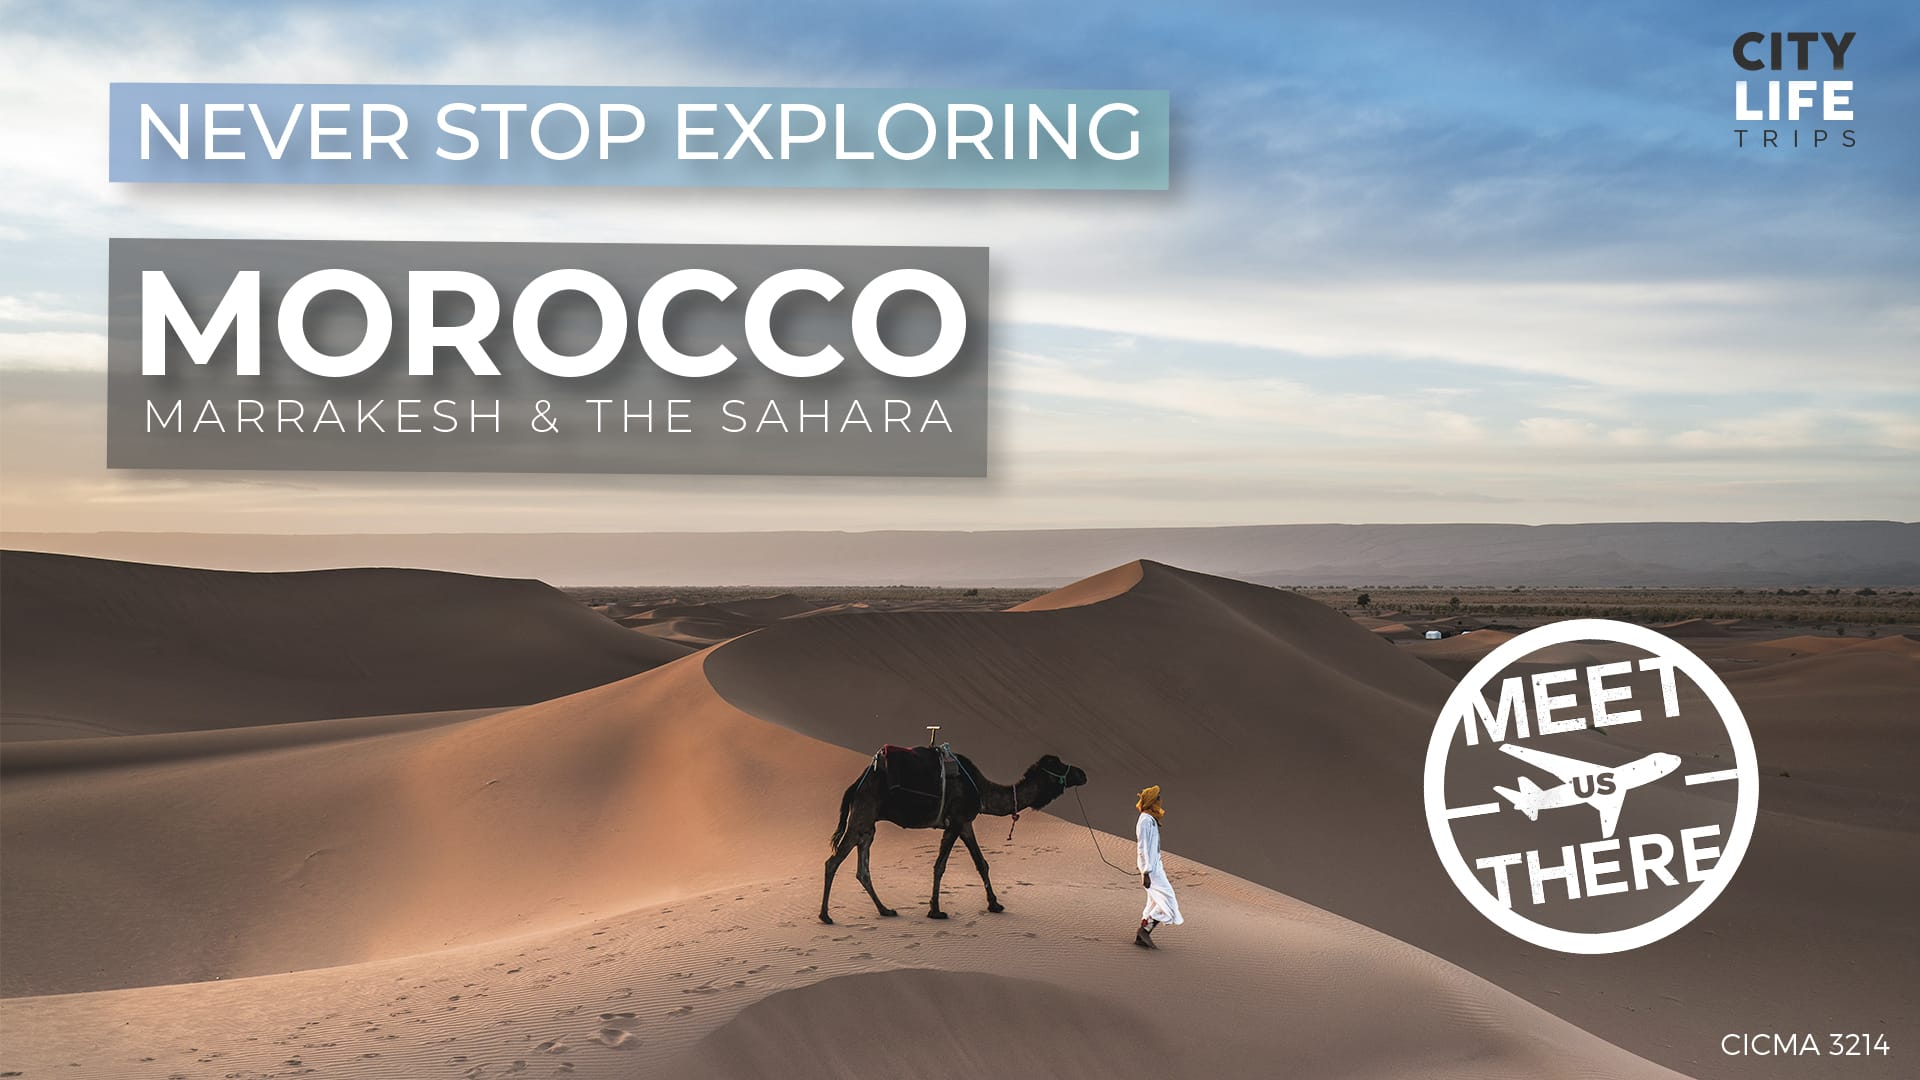 Morocco - Marrakesh & The Sahara